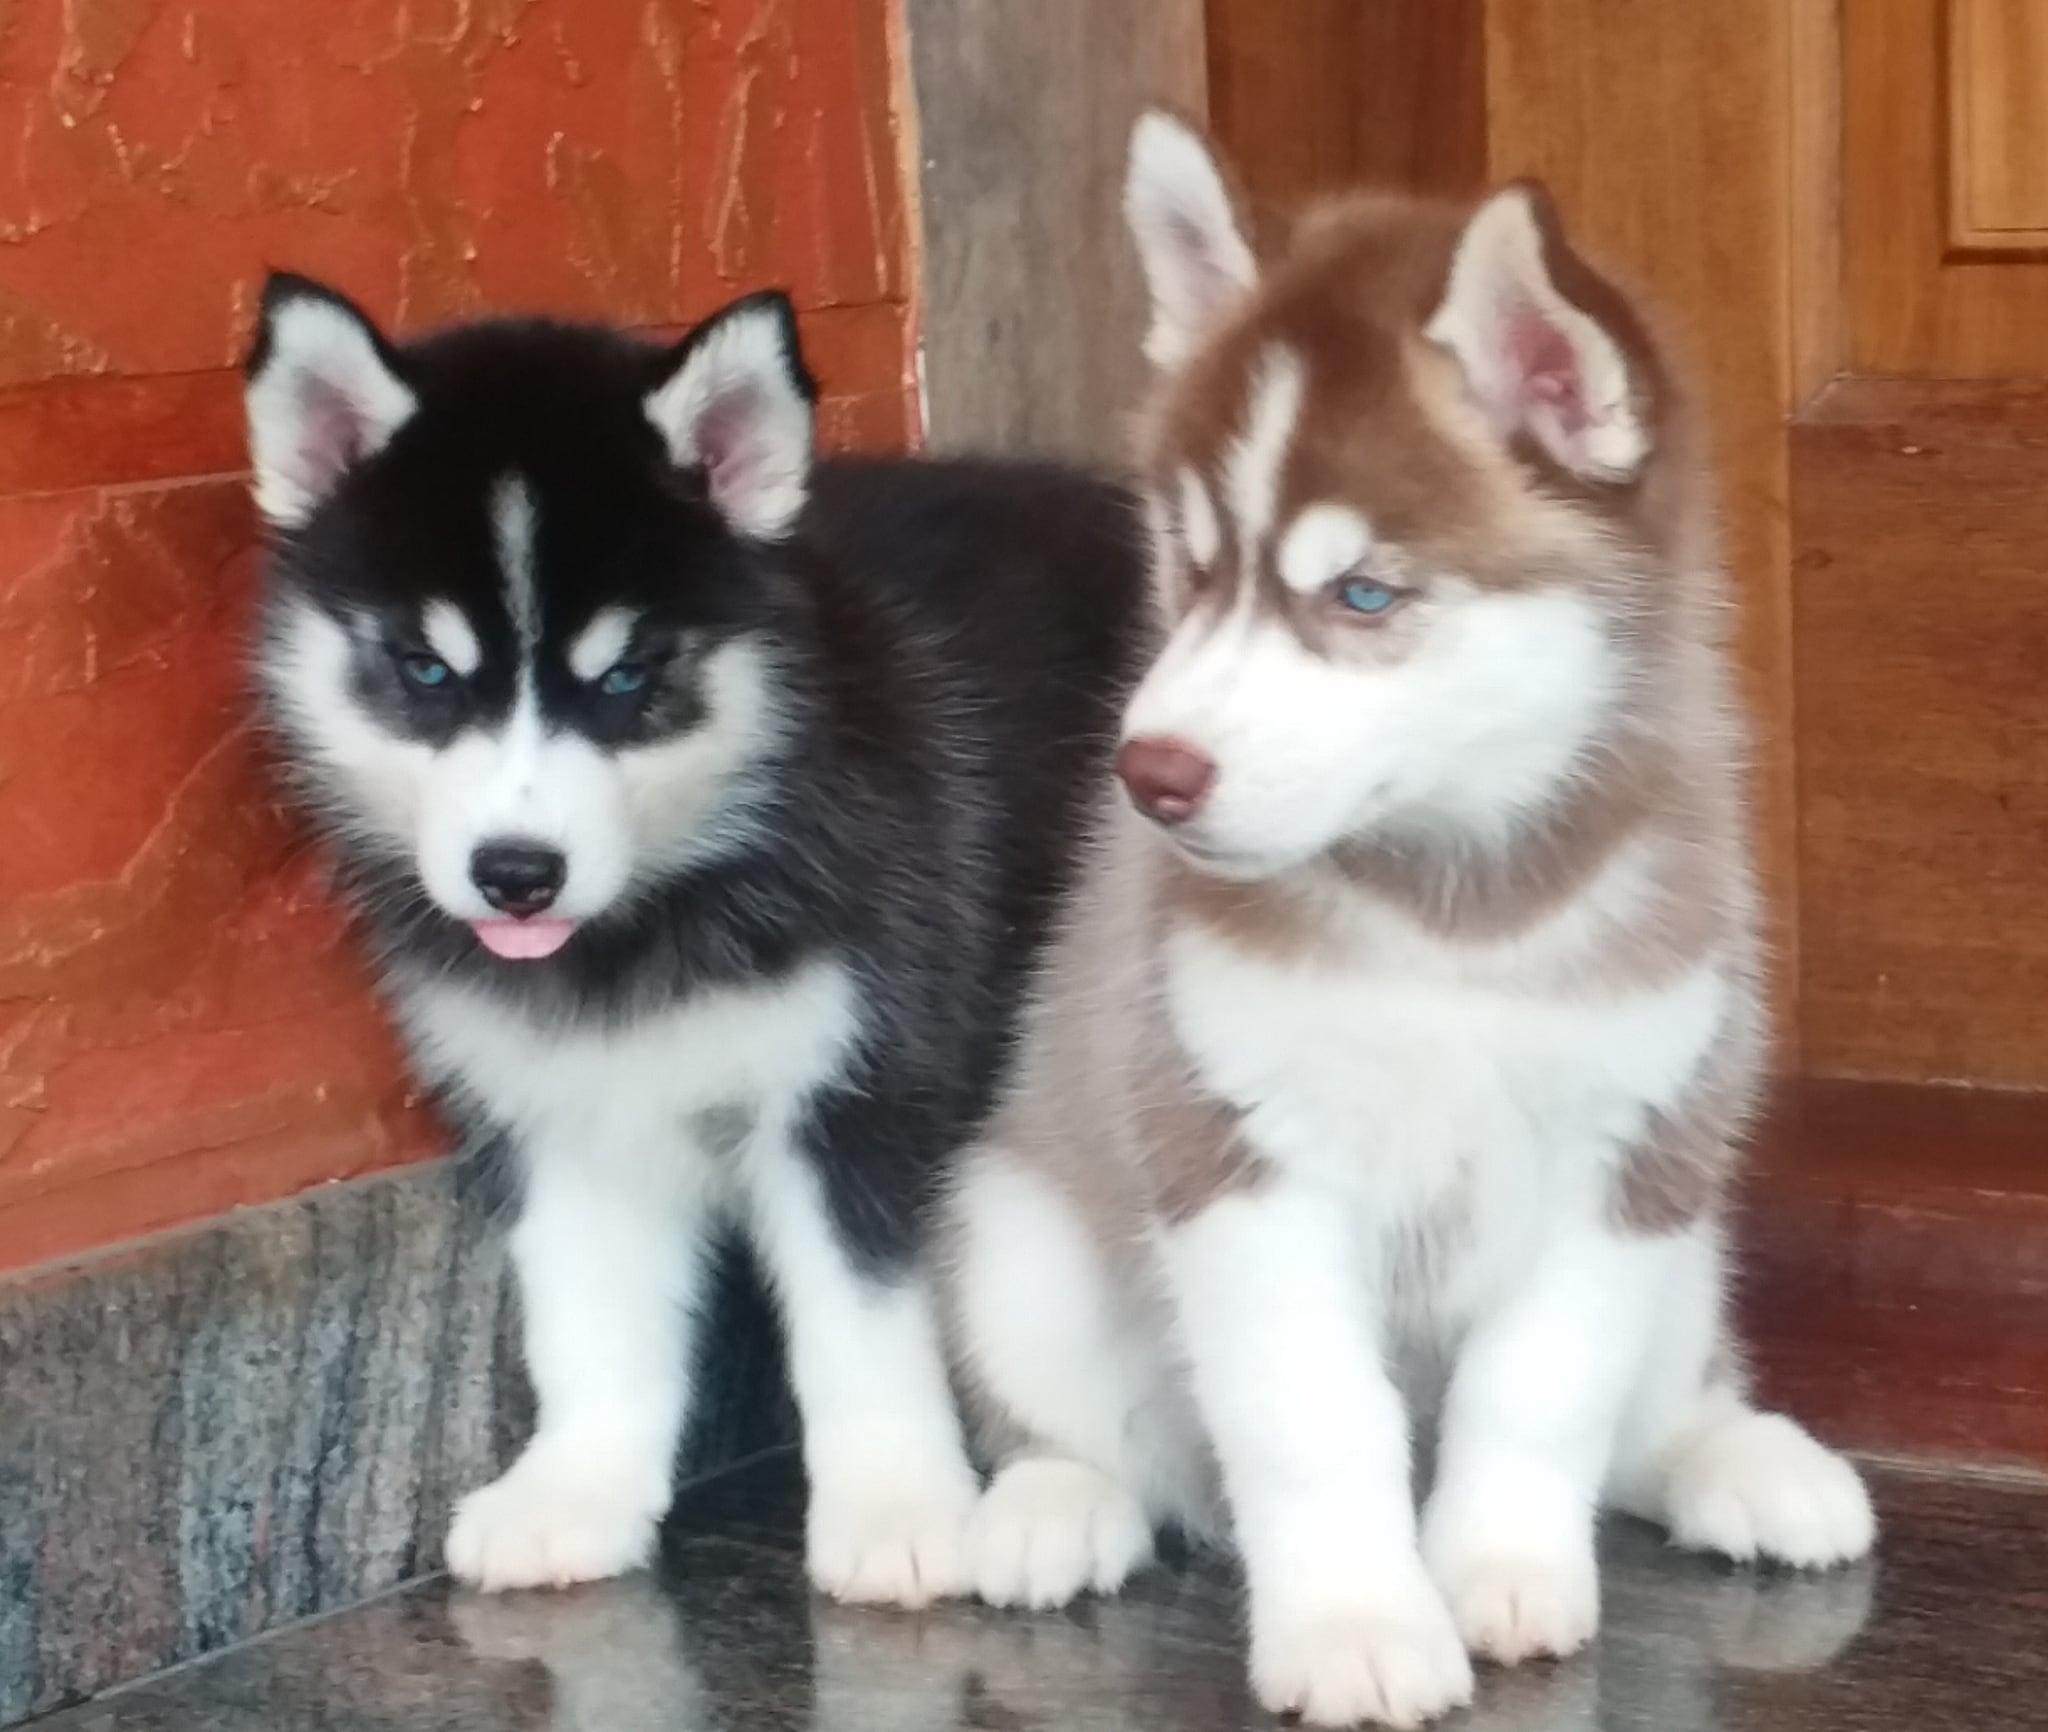 Top 100 Pet Shops in Ernakulam - Best Pet Store & Suppliers - Justdial